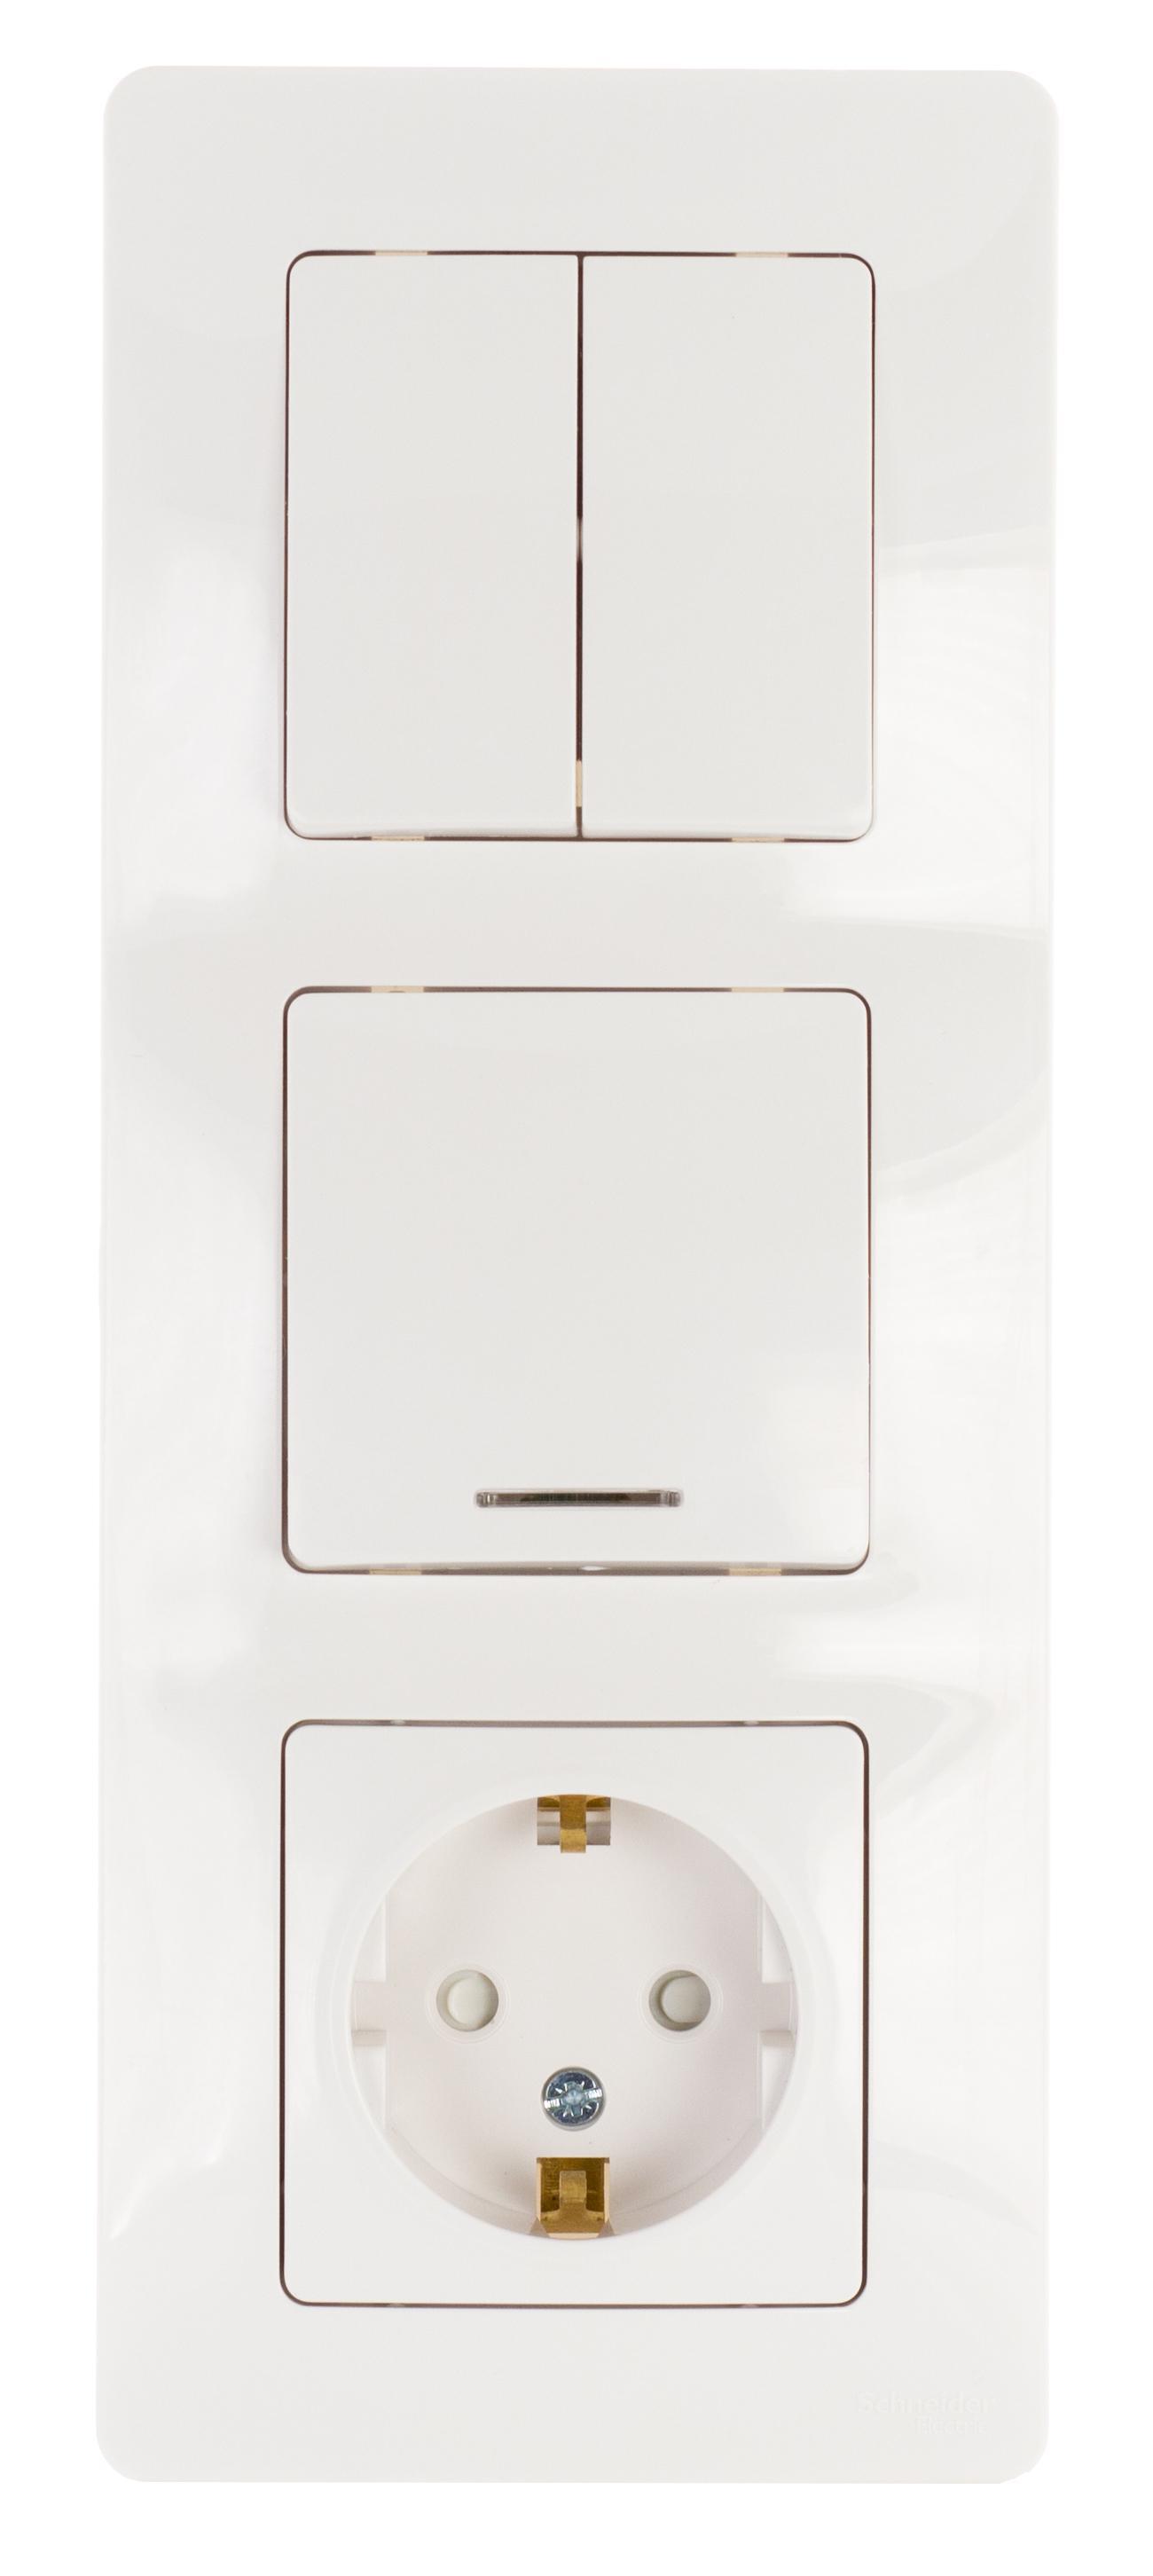 Блок Schneider electric Blnbs101211 blanca панель лицевая schneider electric actassi 1 модуль белый 24 шт vdi88240